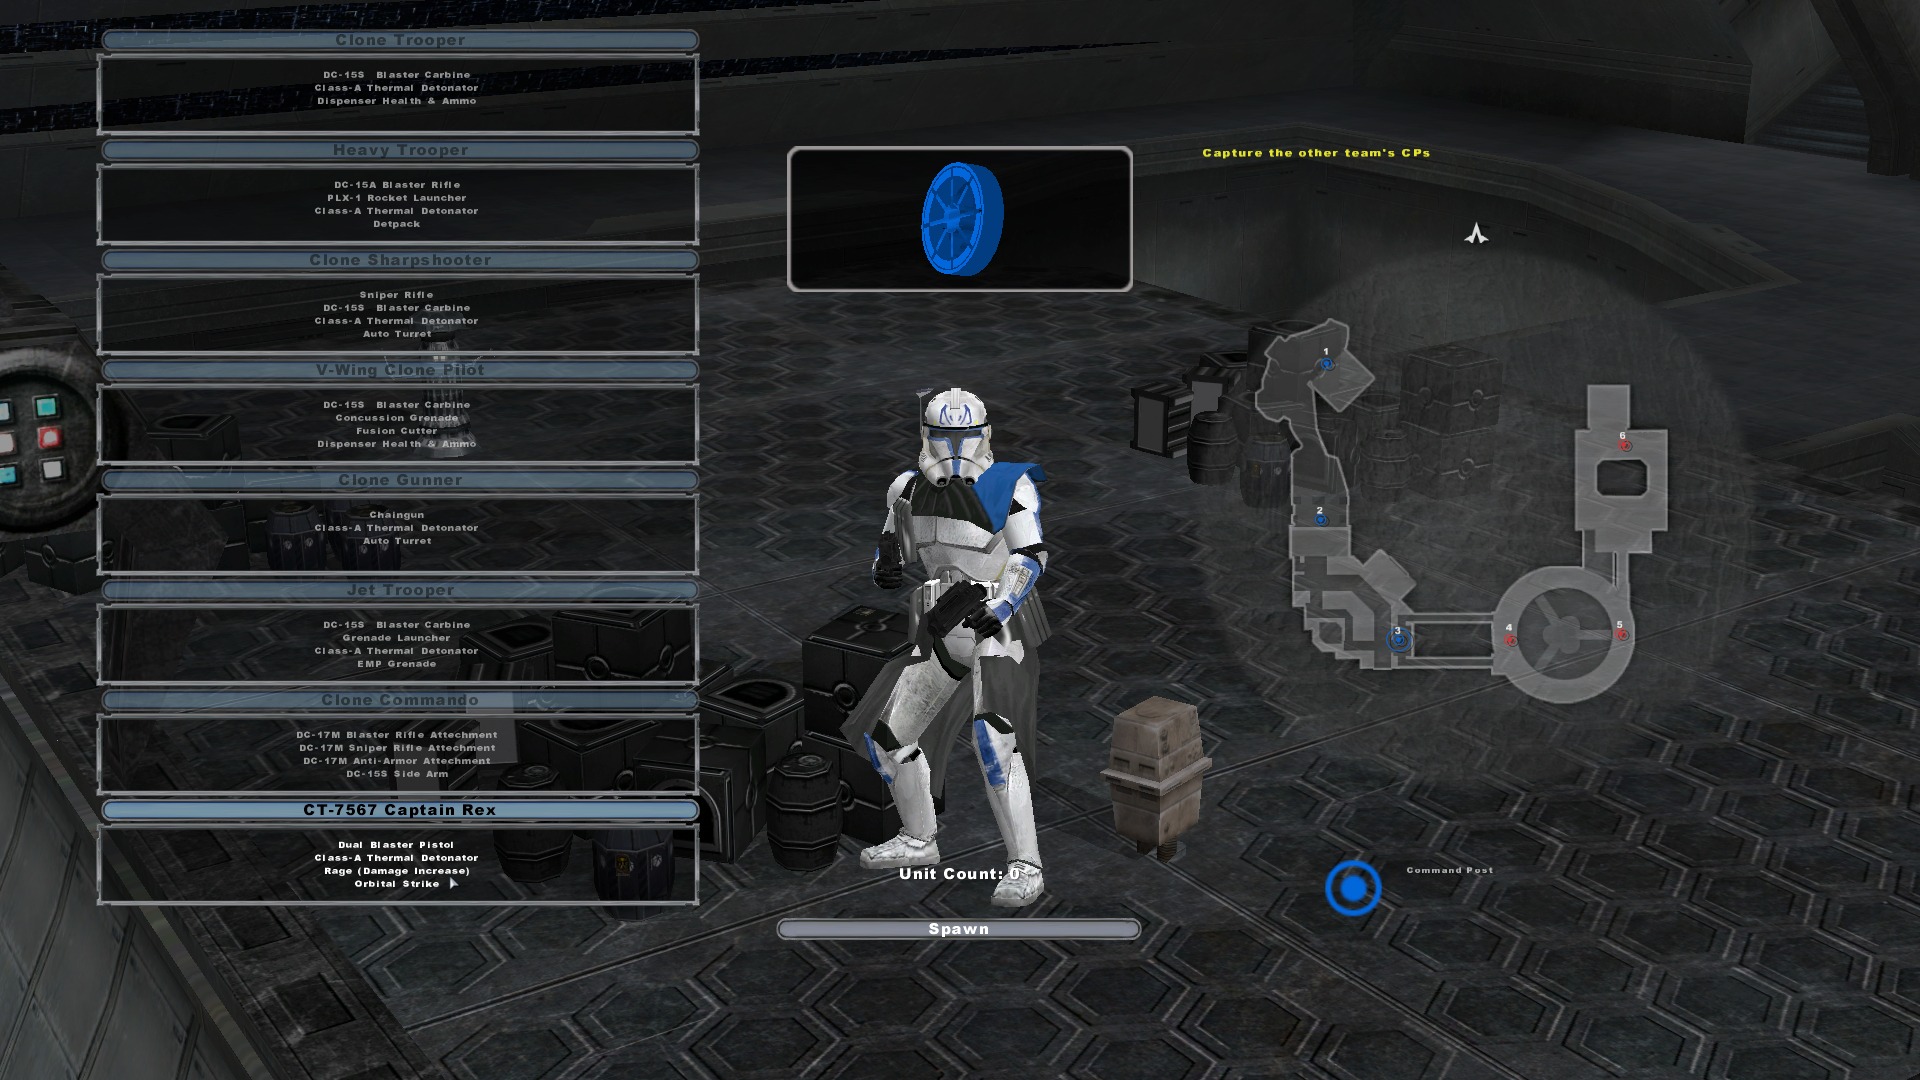 Captain Rex 2 0 Image Star Wars Battlefront 2 Legends Reboot